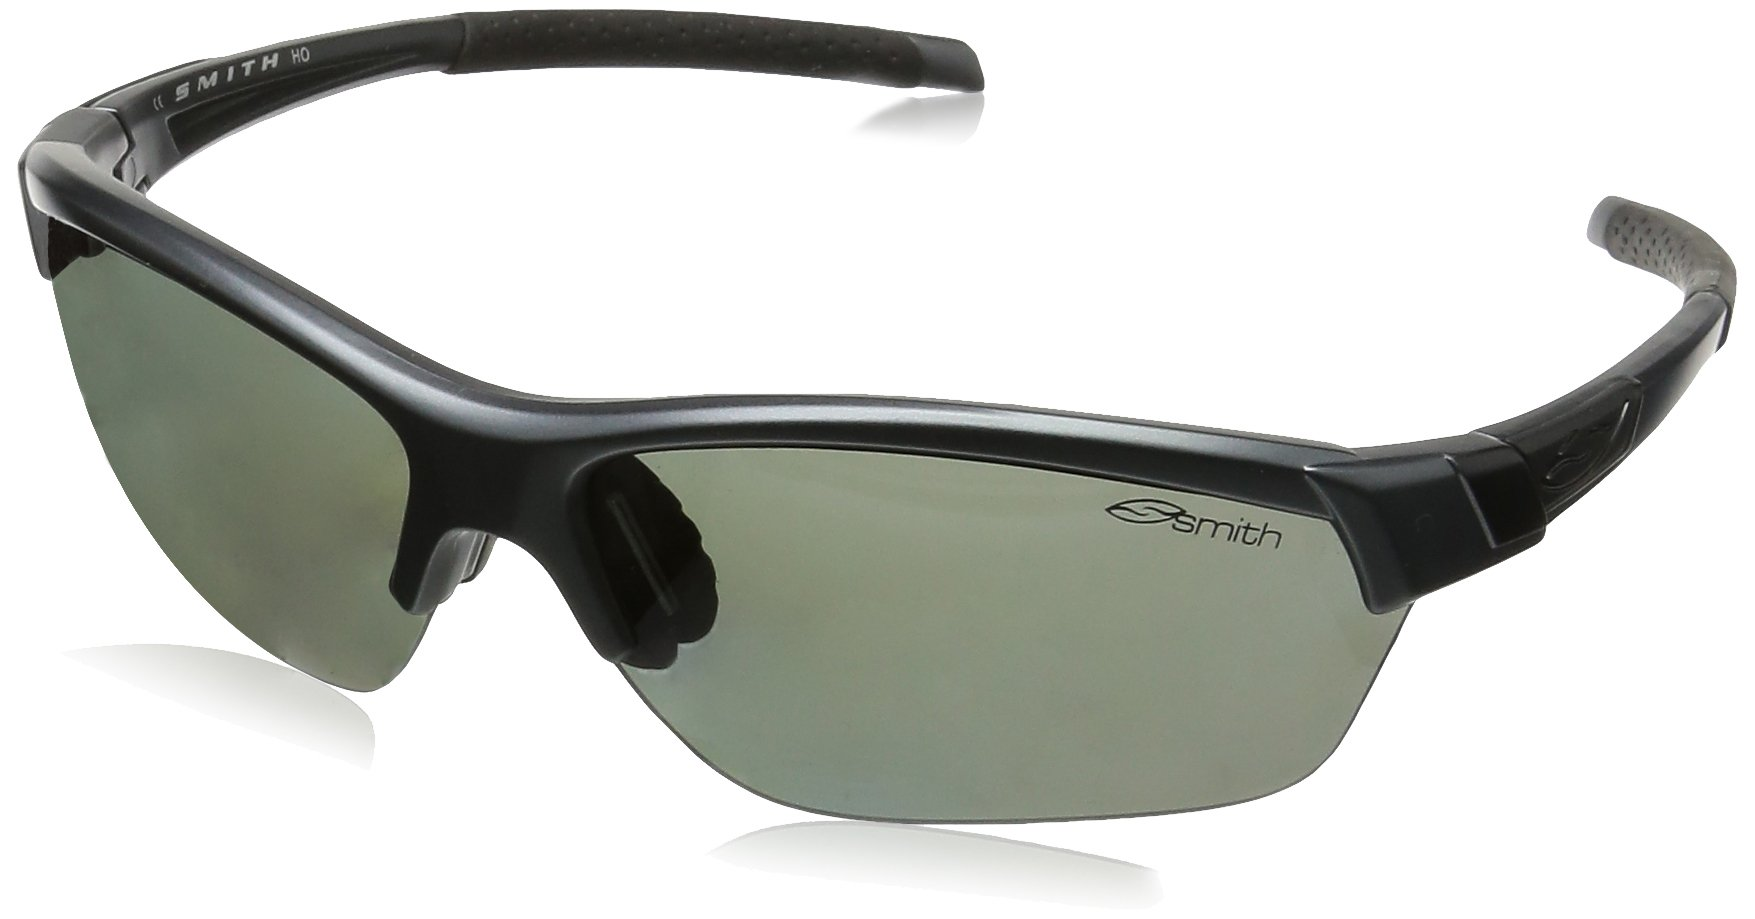 Smith Optics Approach Max (NEW) Sunglasses, Matte Graphite, Polarized Platinum/Ignitor/Clear by Smith Optics